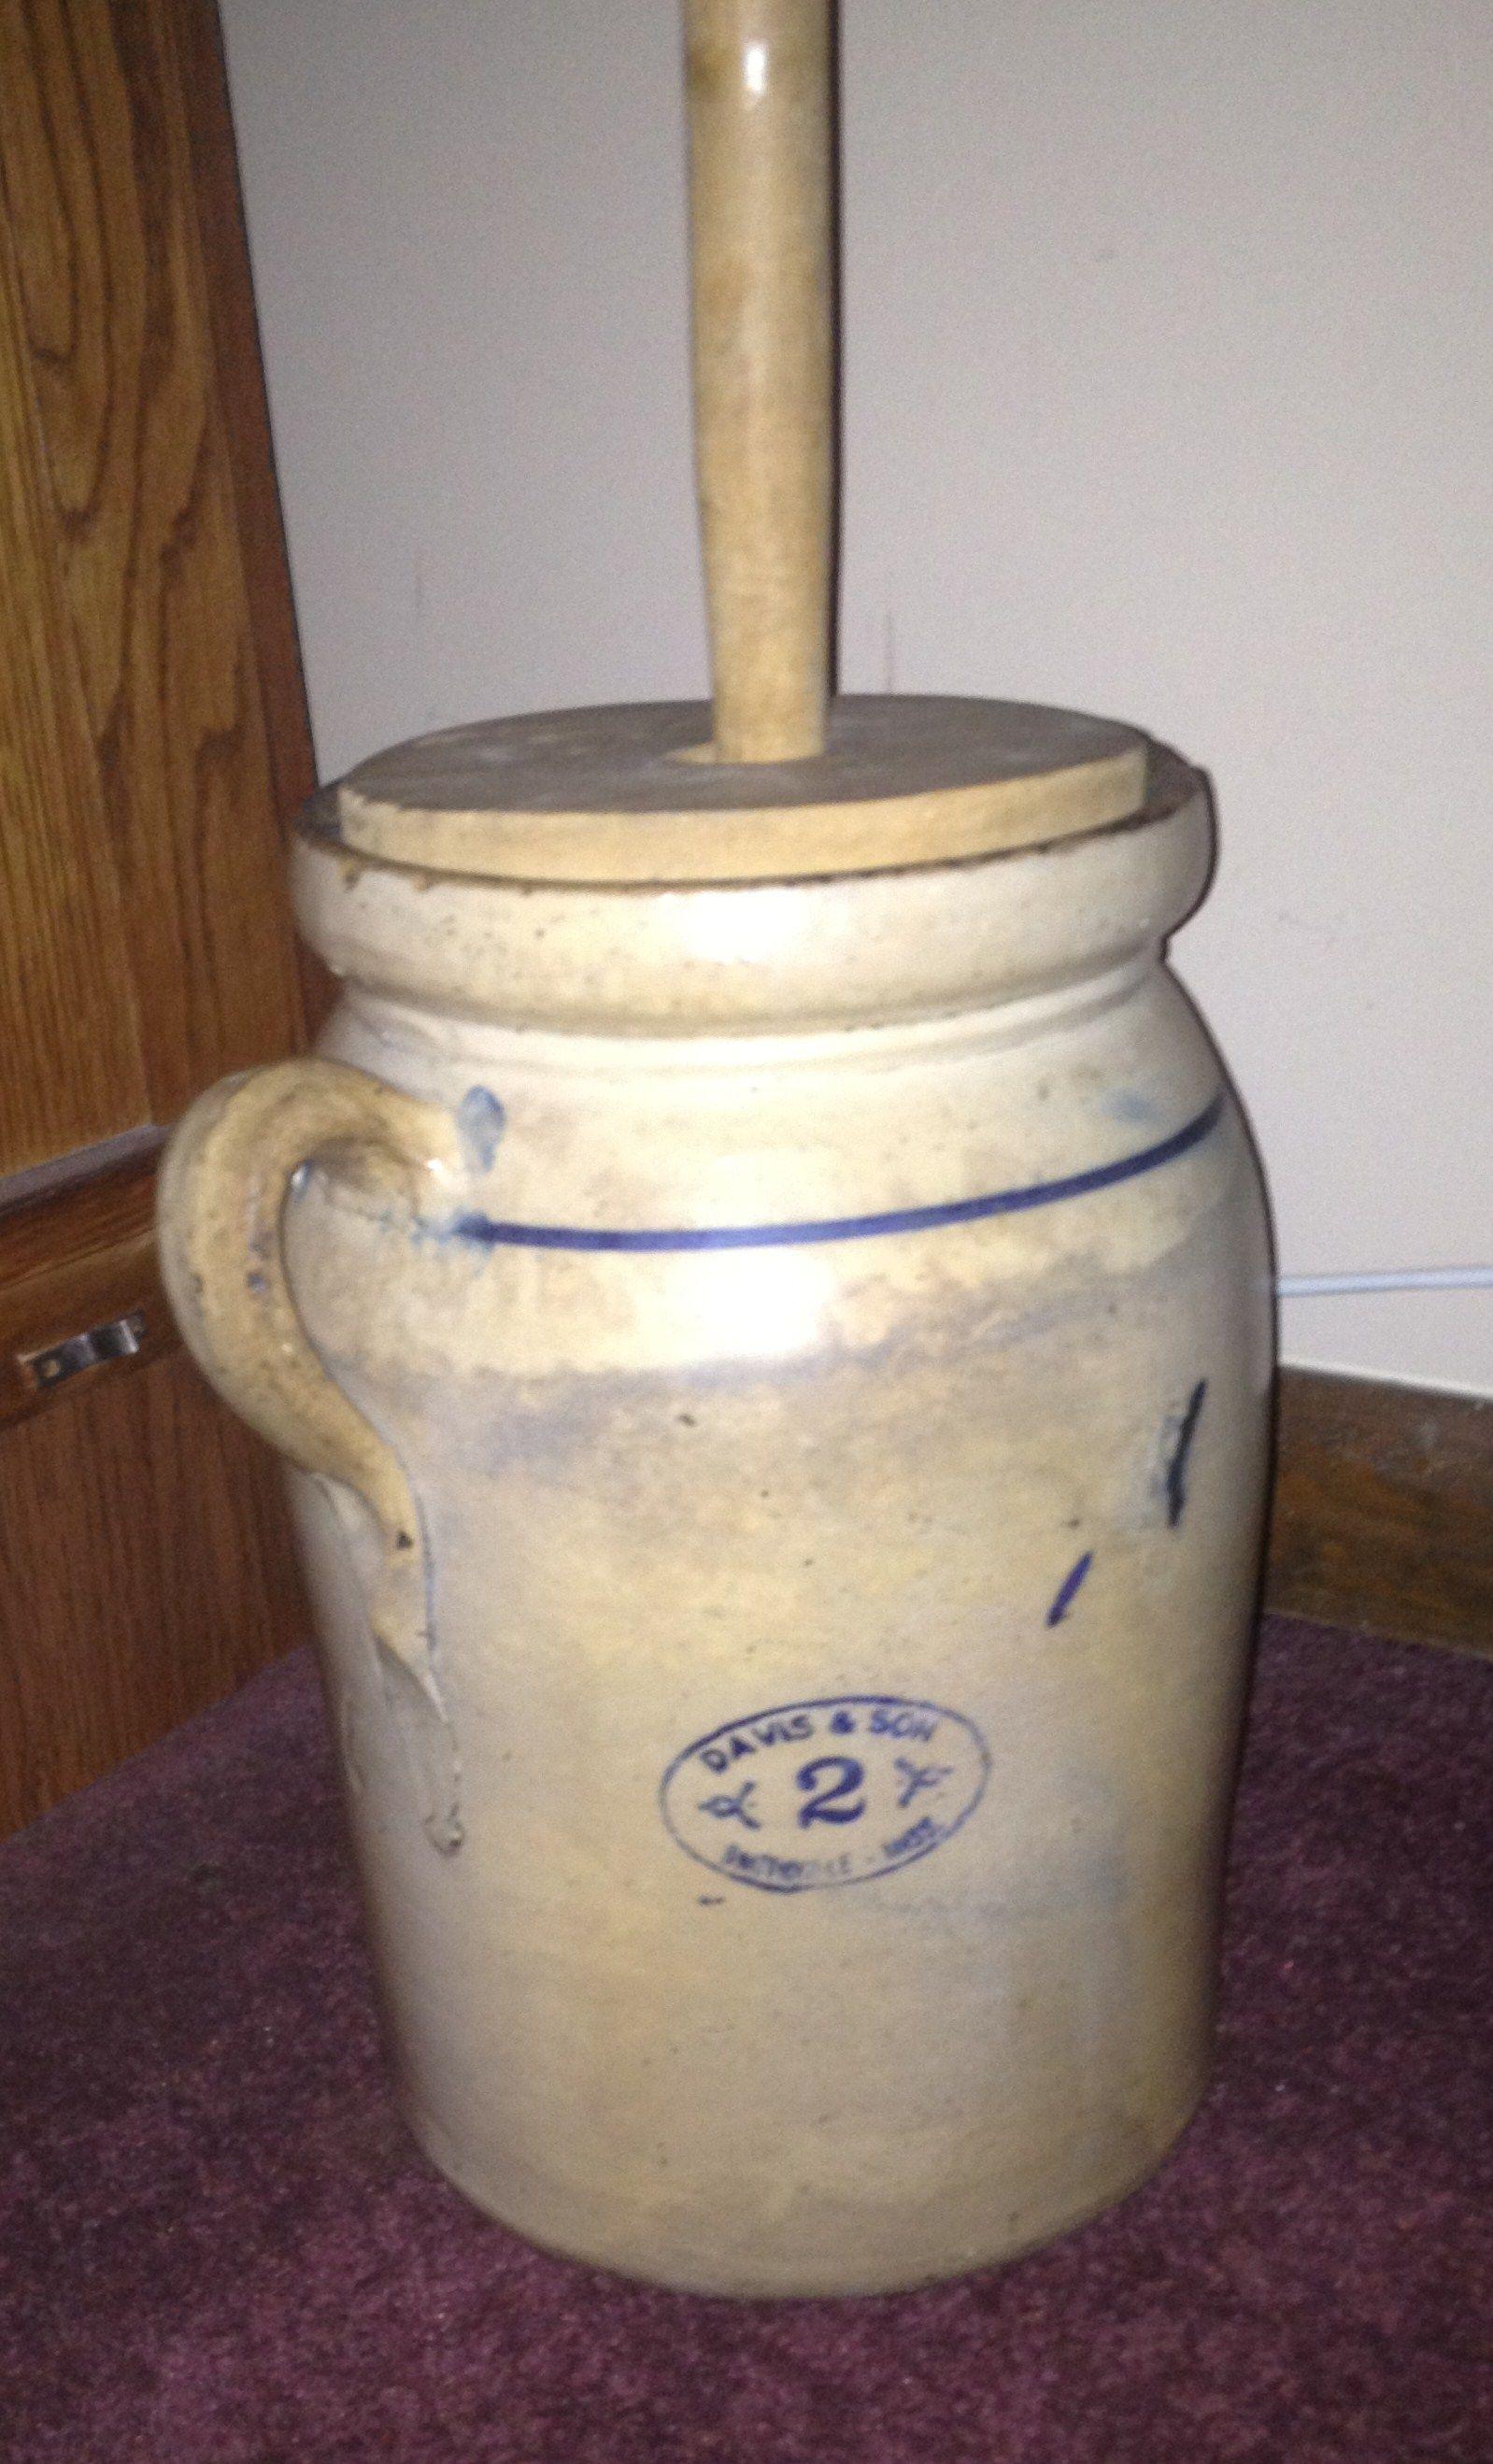 Davis And Son Pottery 2 Gallon Butter Churn Stoneware